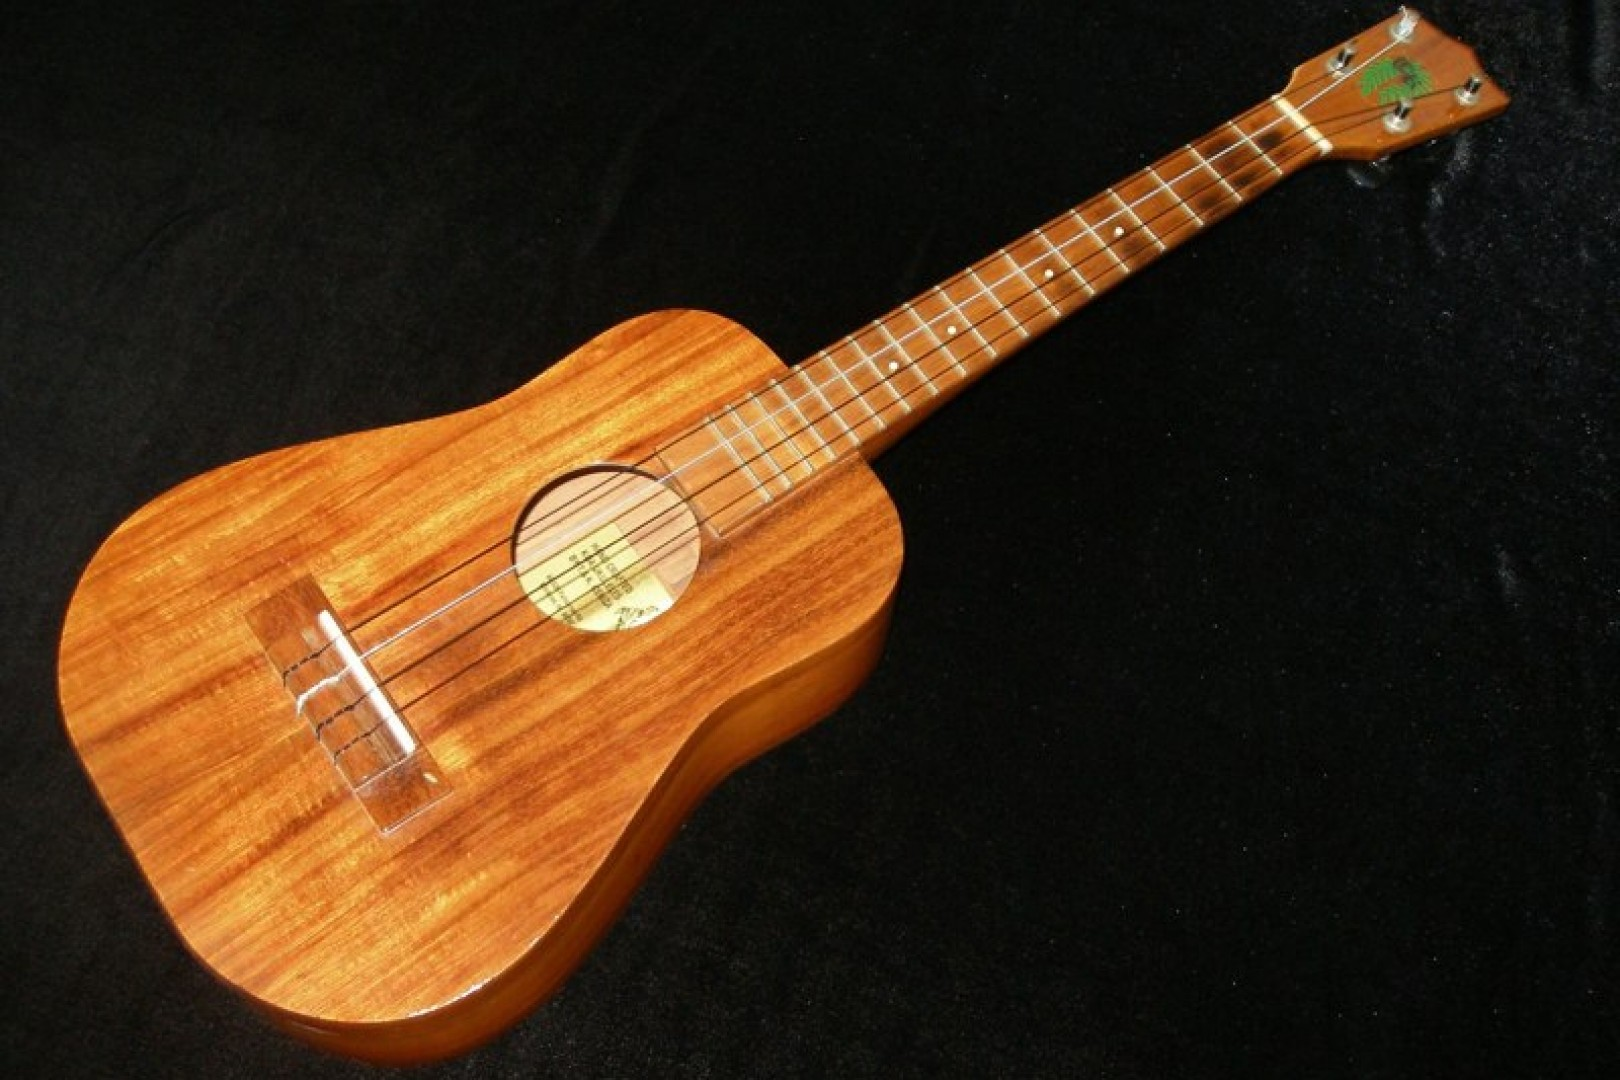 ukulele friend ceniza ukulele for sale ukulele friend. Black Bedroom Furniture Sets. Home Design Ideas